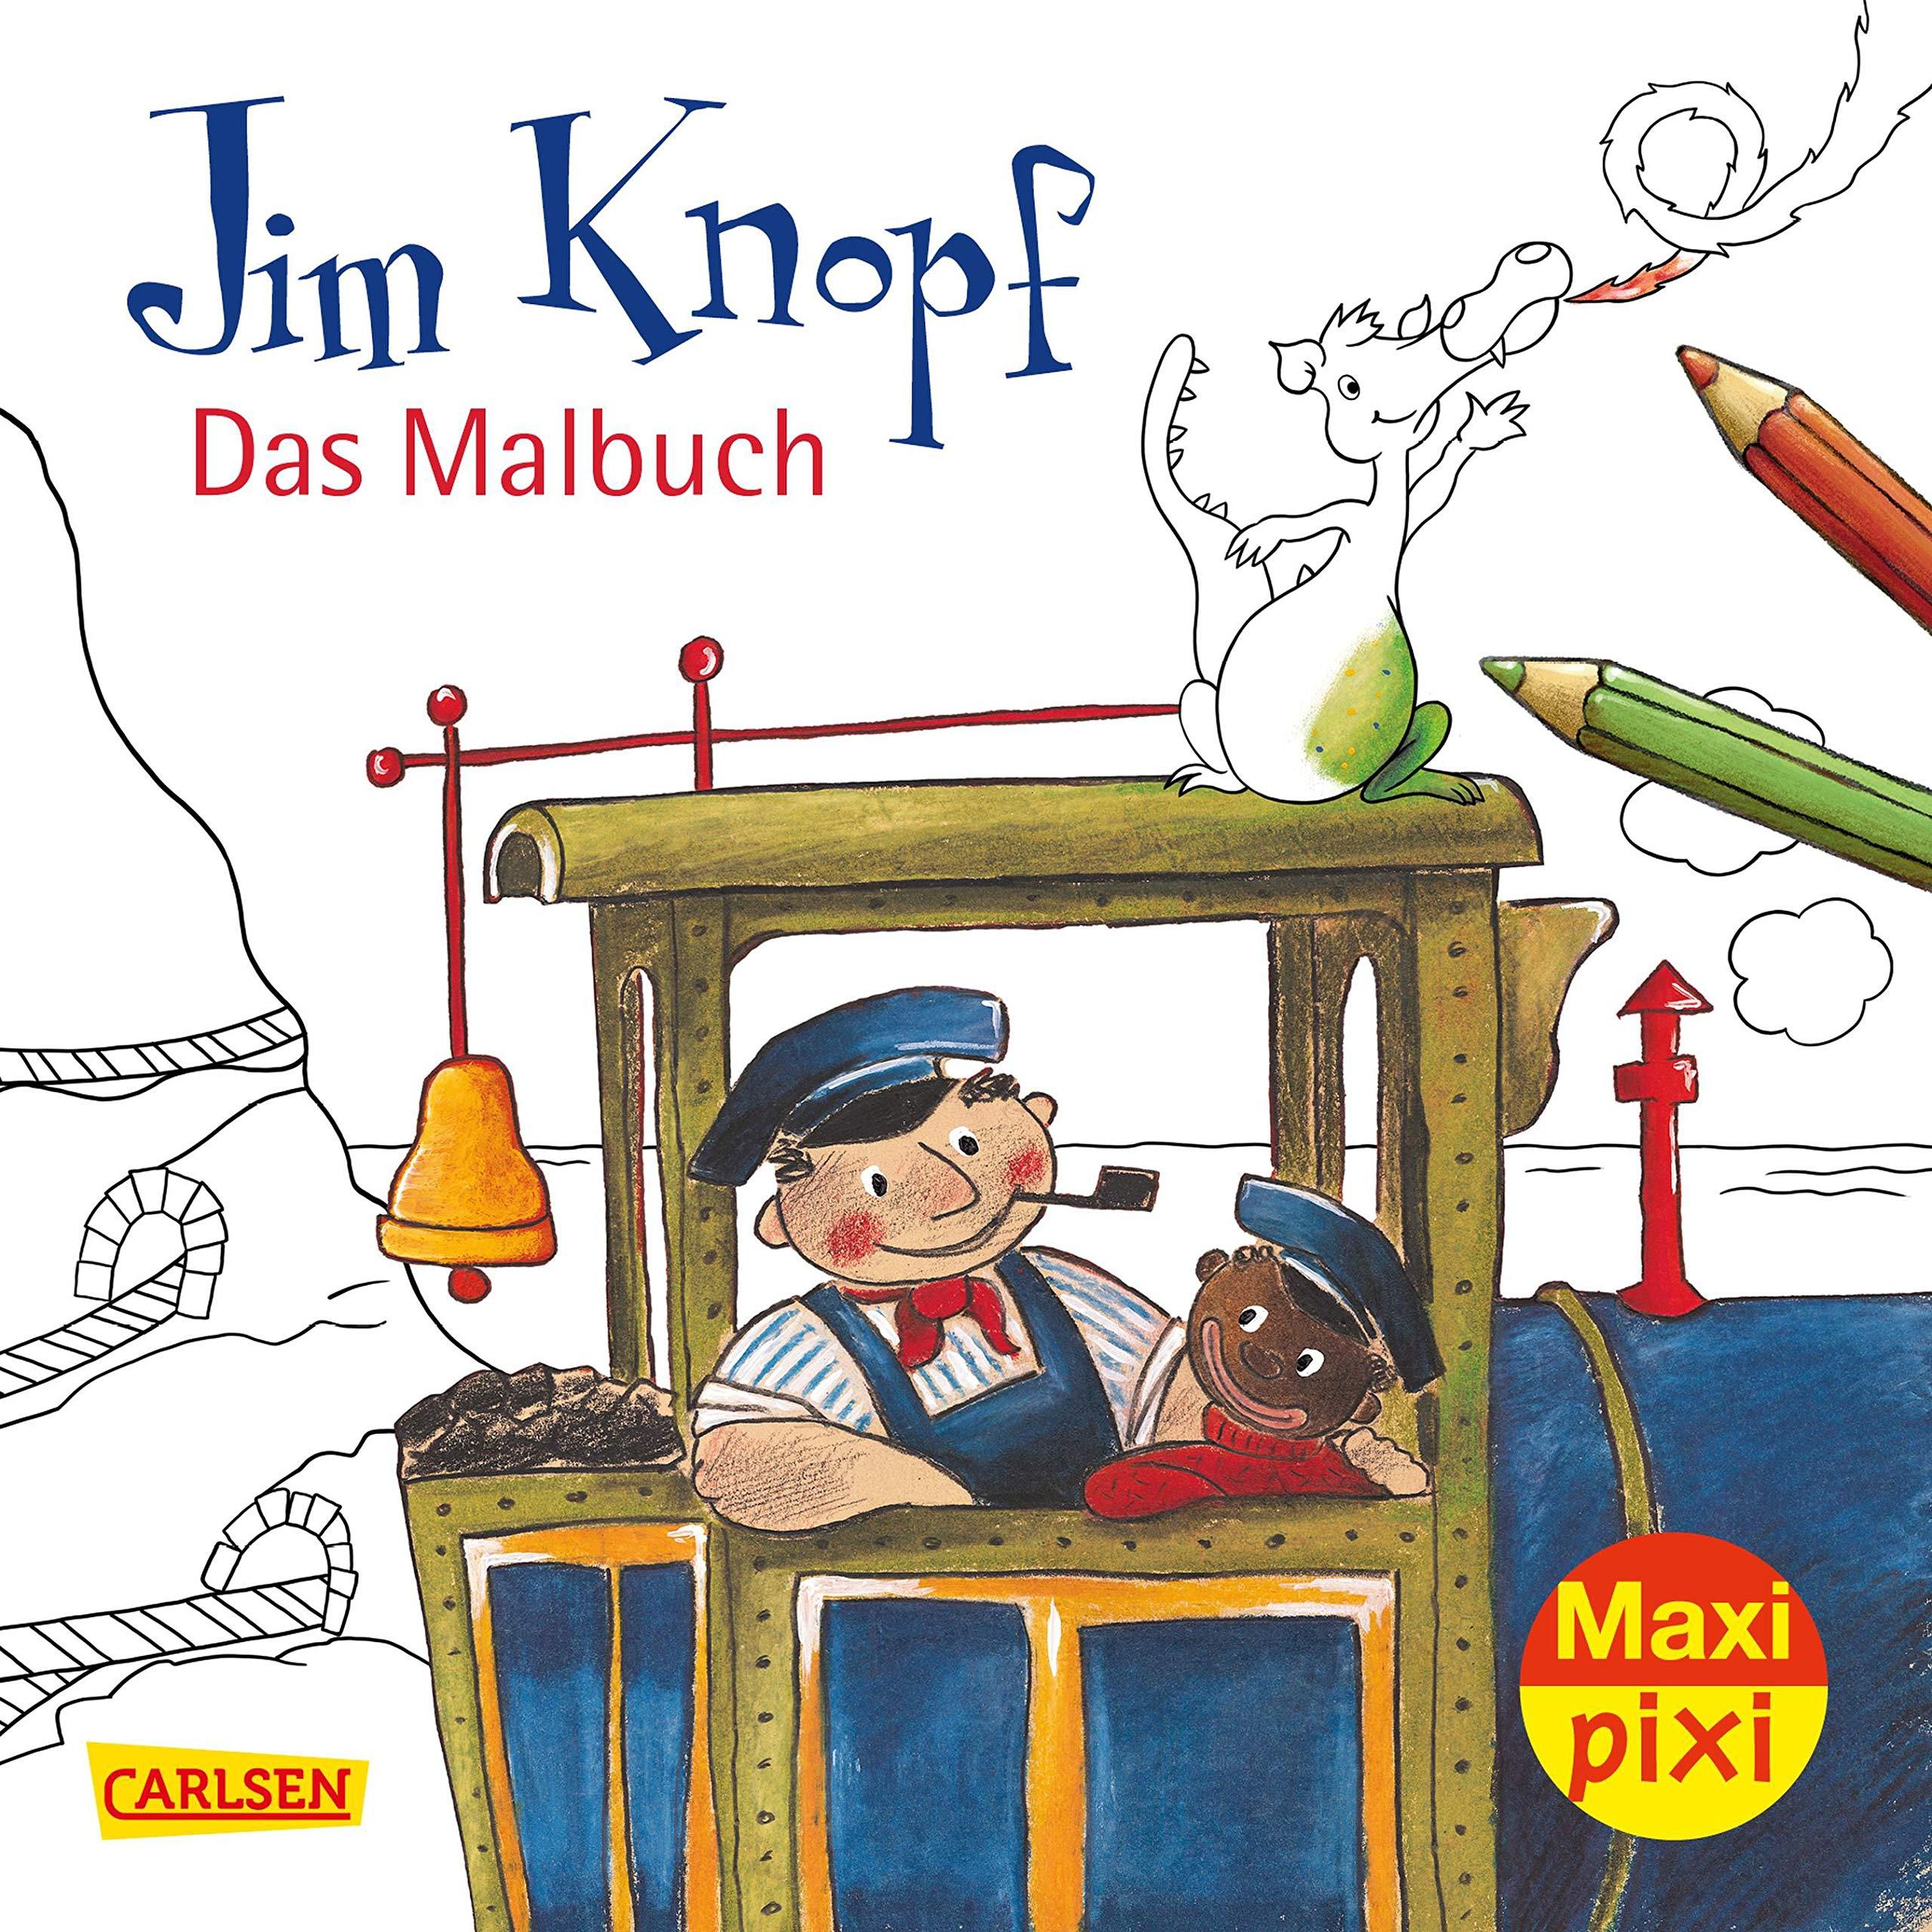 Ve 5 Jim Knopf Malbuch 5 Exemplare Maxi Pixi Band 269 Amazon De Ende Michael Dolling Beate Weber Mathias Dolinger Igor Tripp F J Bucher